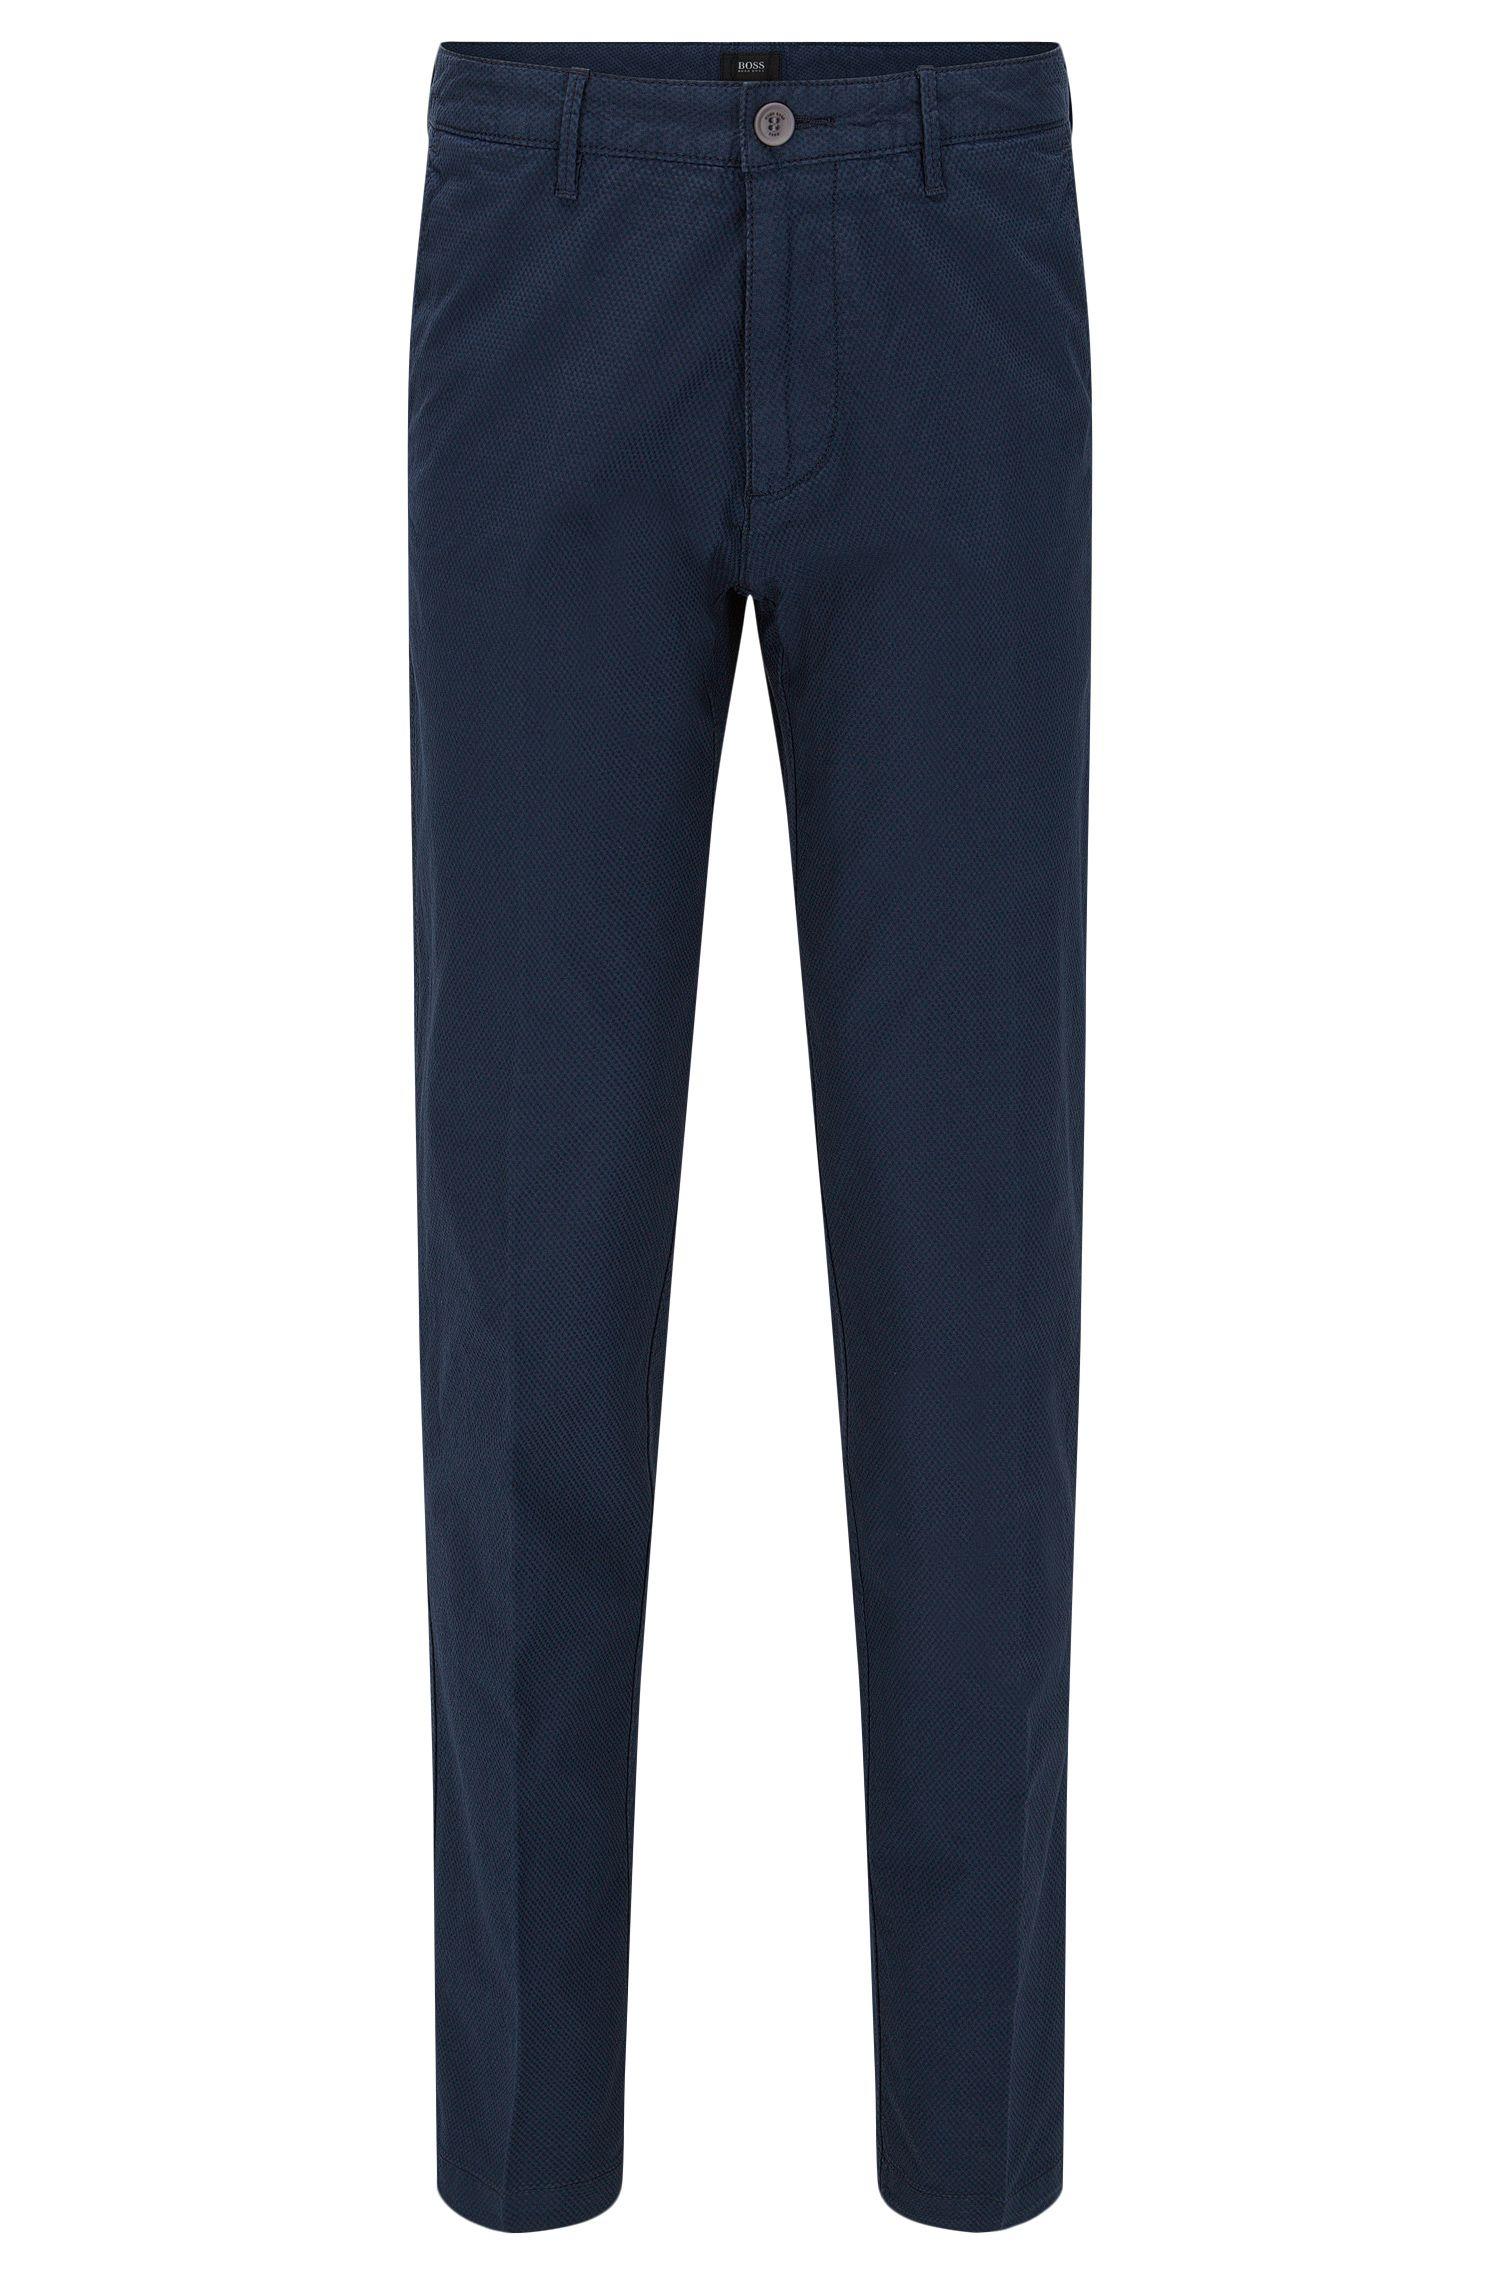 'Crigan D'   Regular Fit, Stretch Cotton Trousers